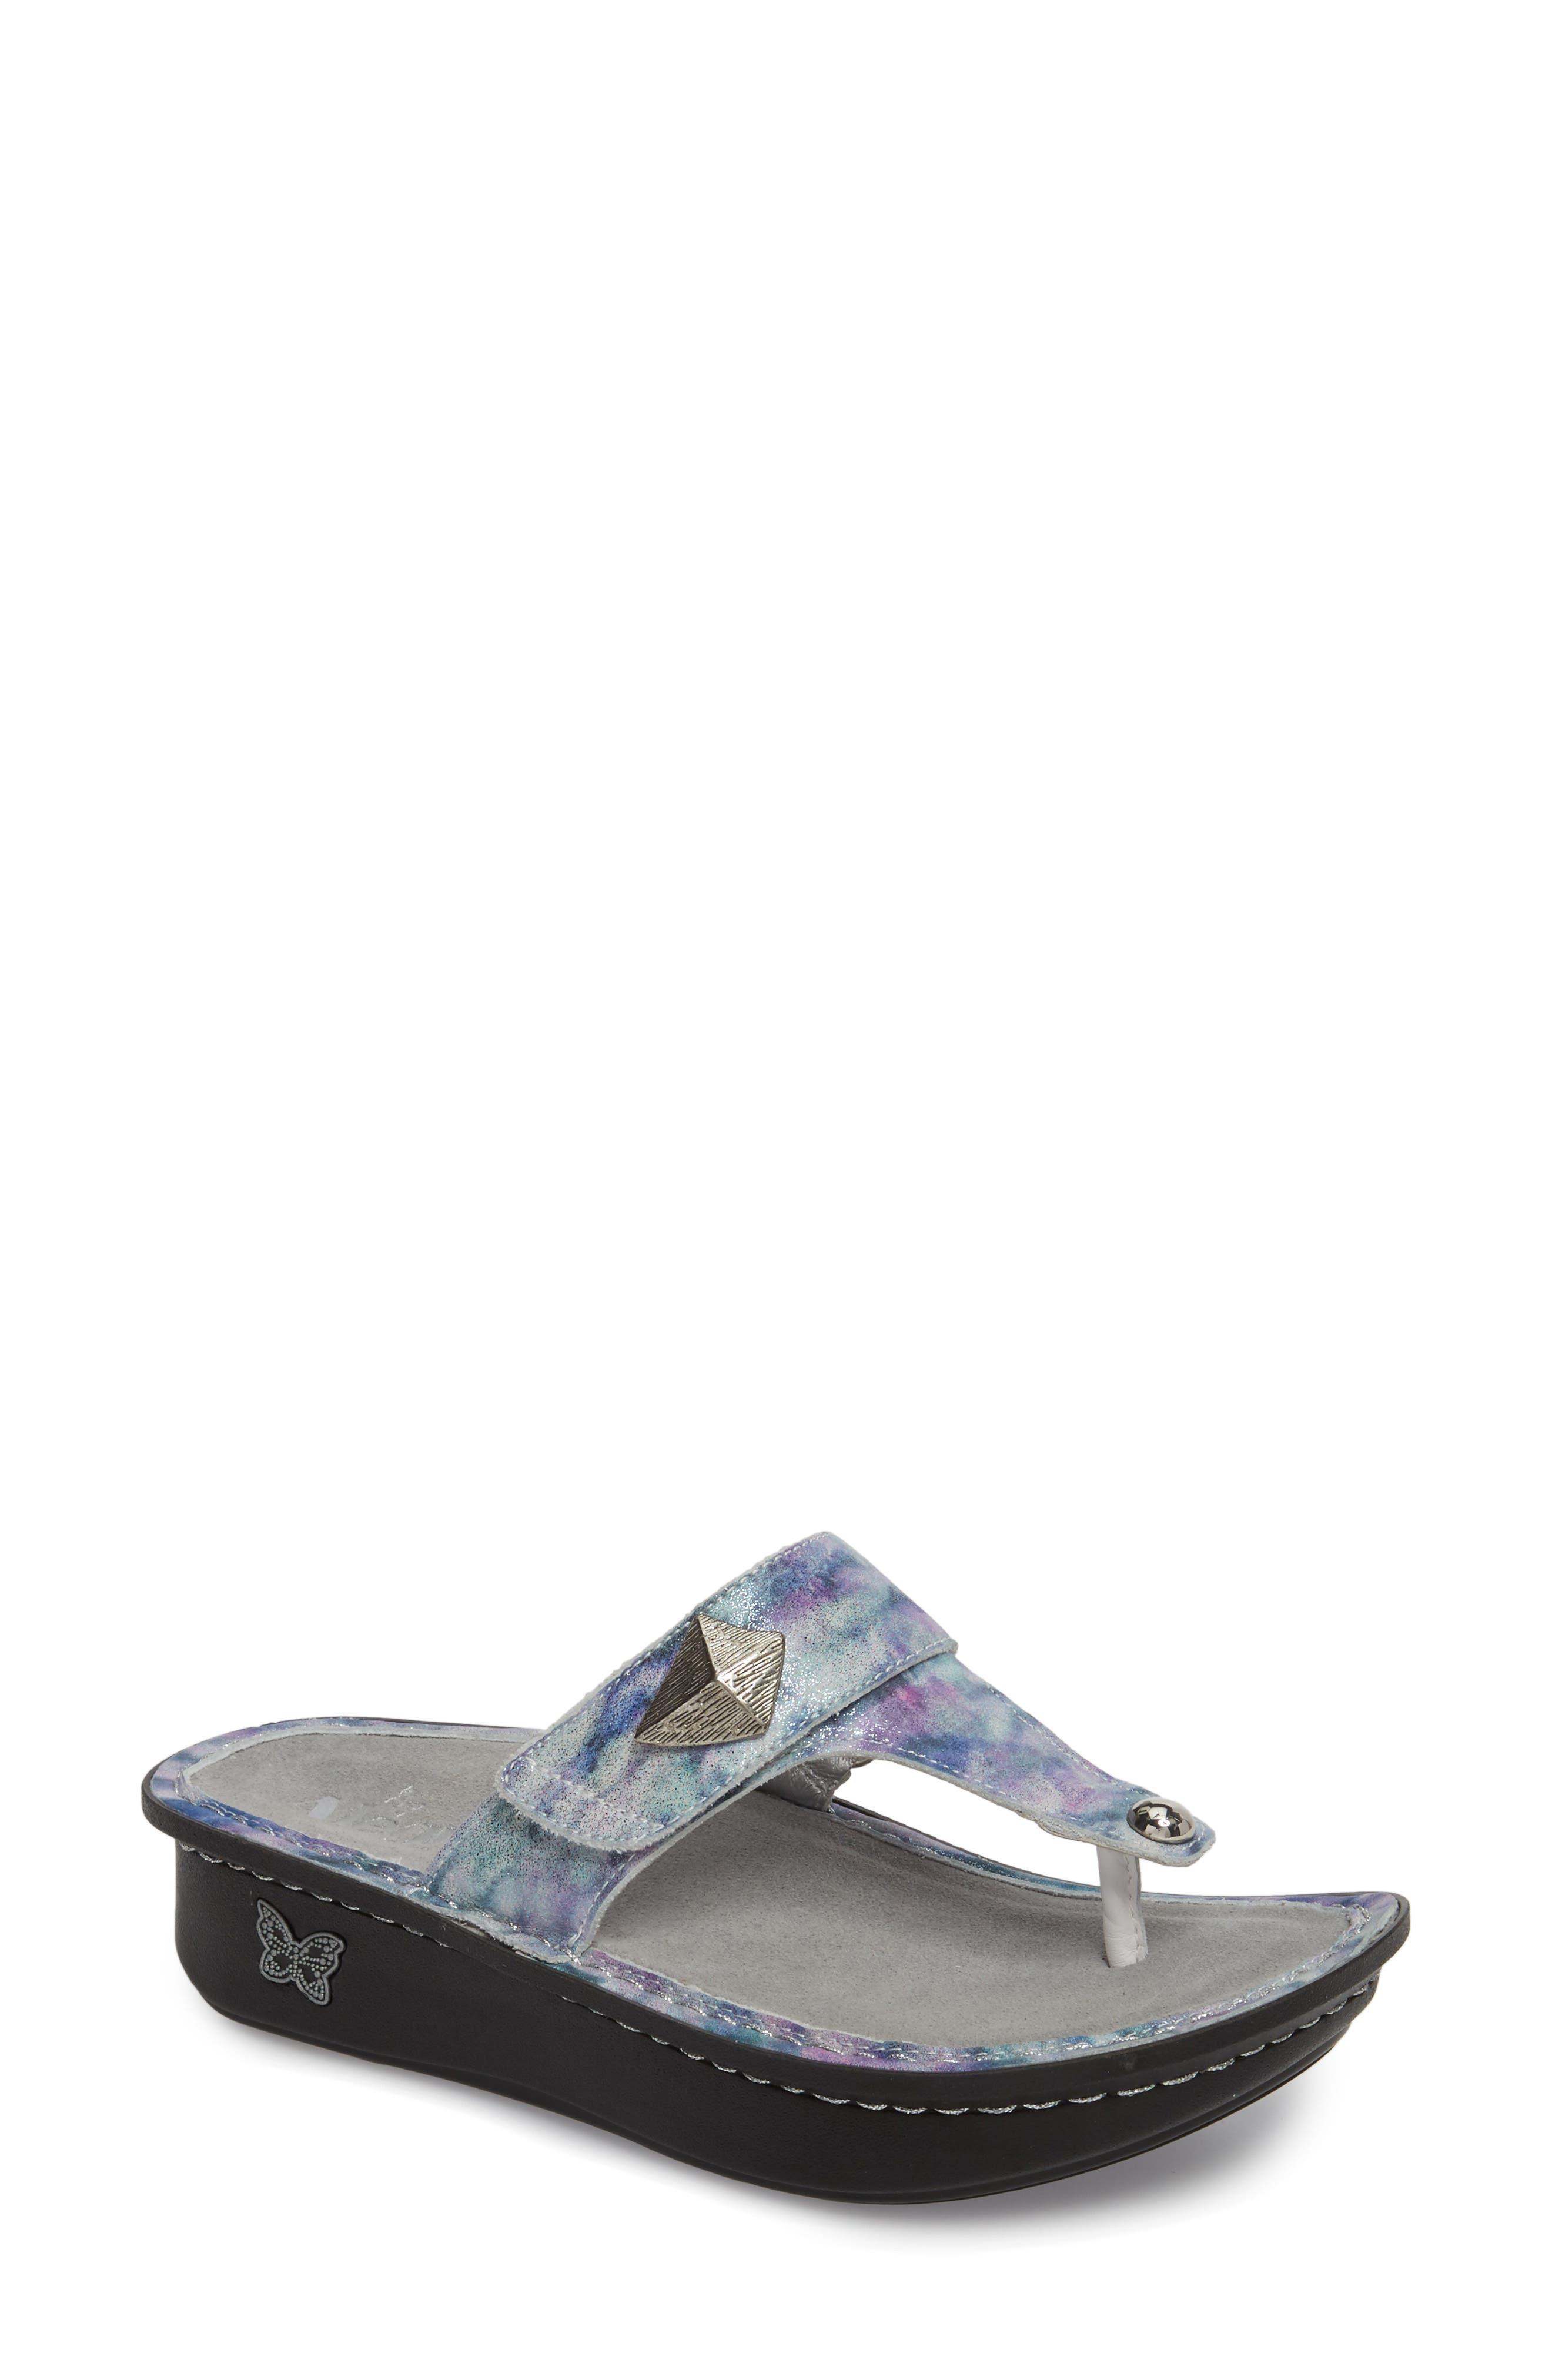 'Carina' Sandal,                             Main thumbnail 1, color,                             Mellow Out Leather